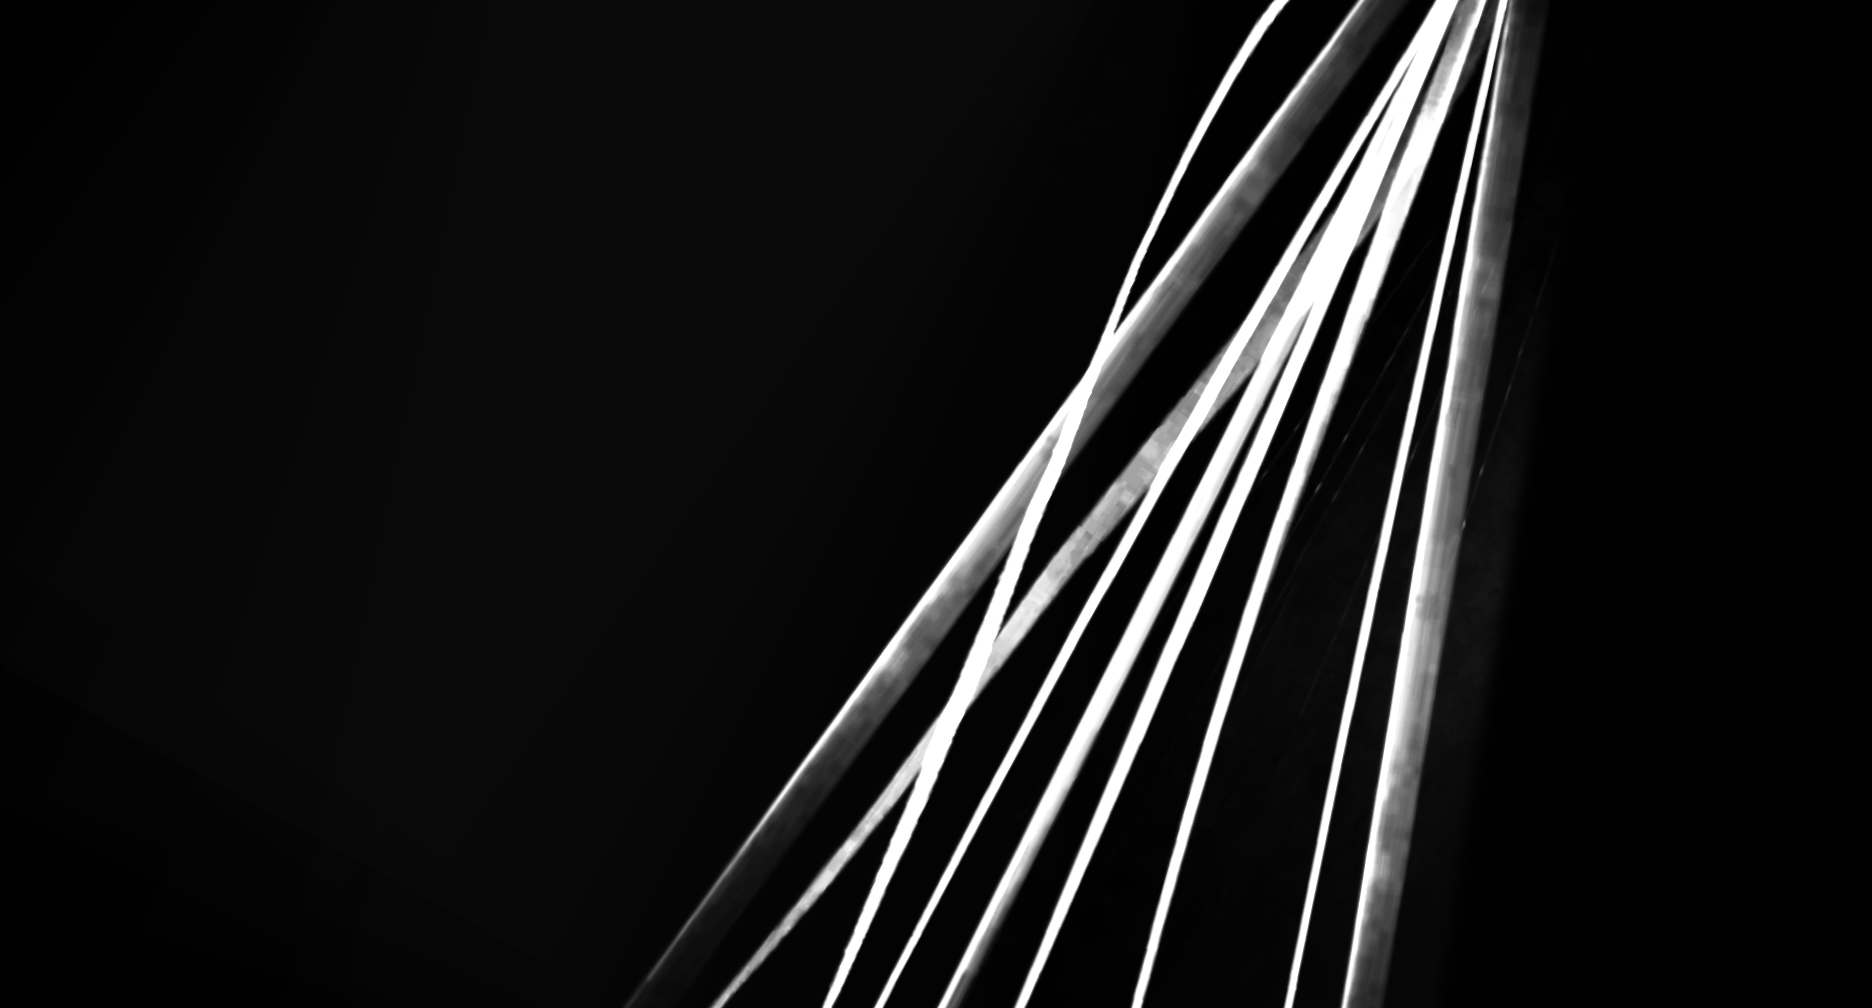 string_screencap__0005_6.jpg